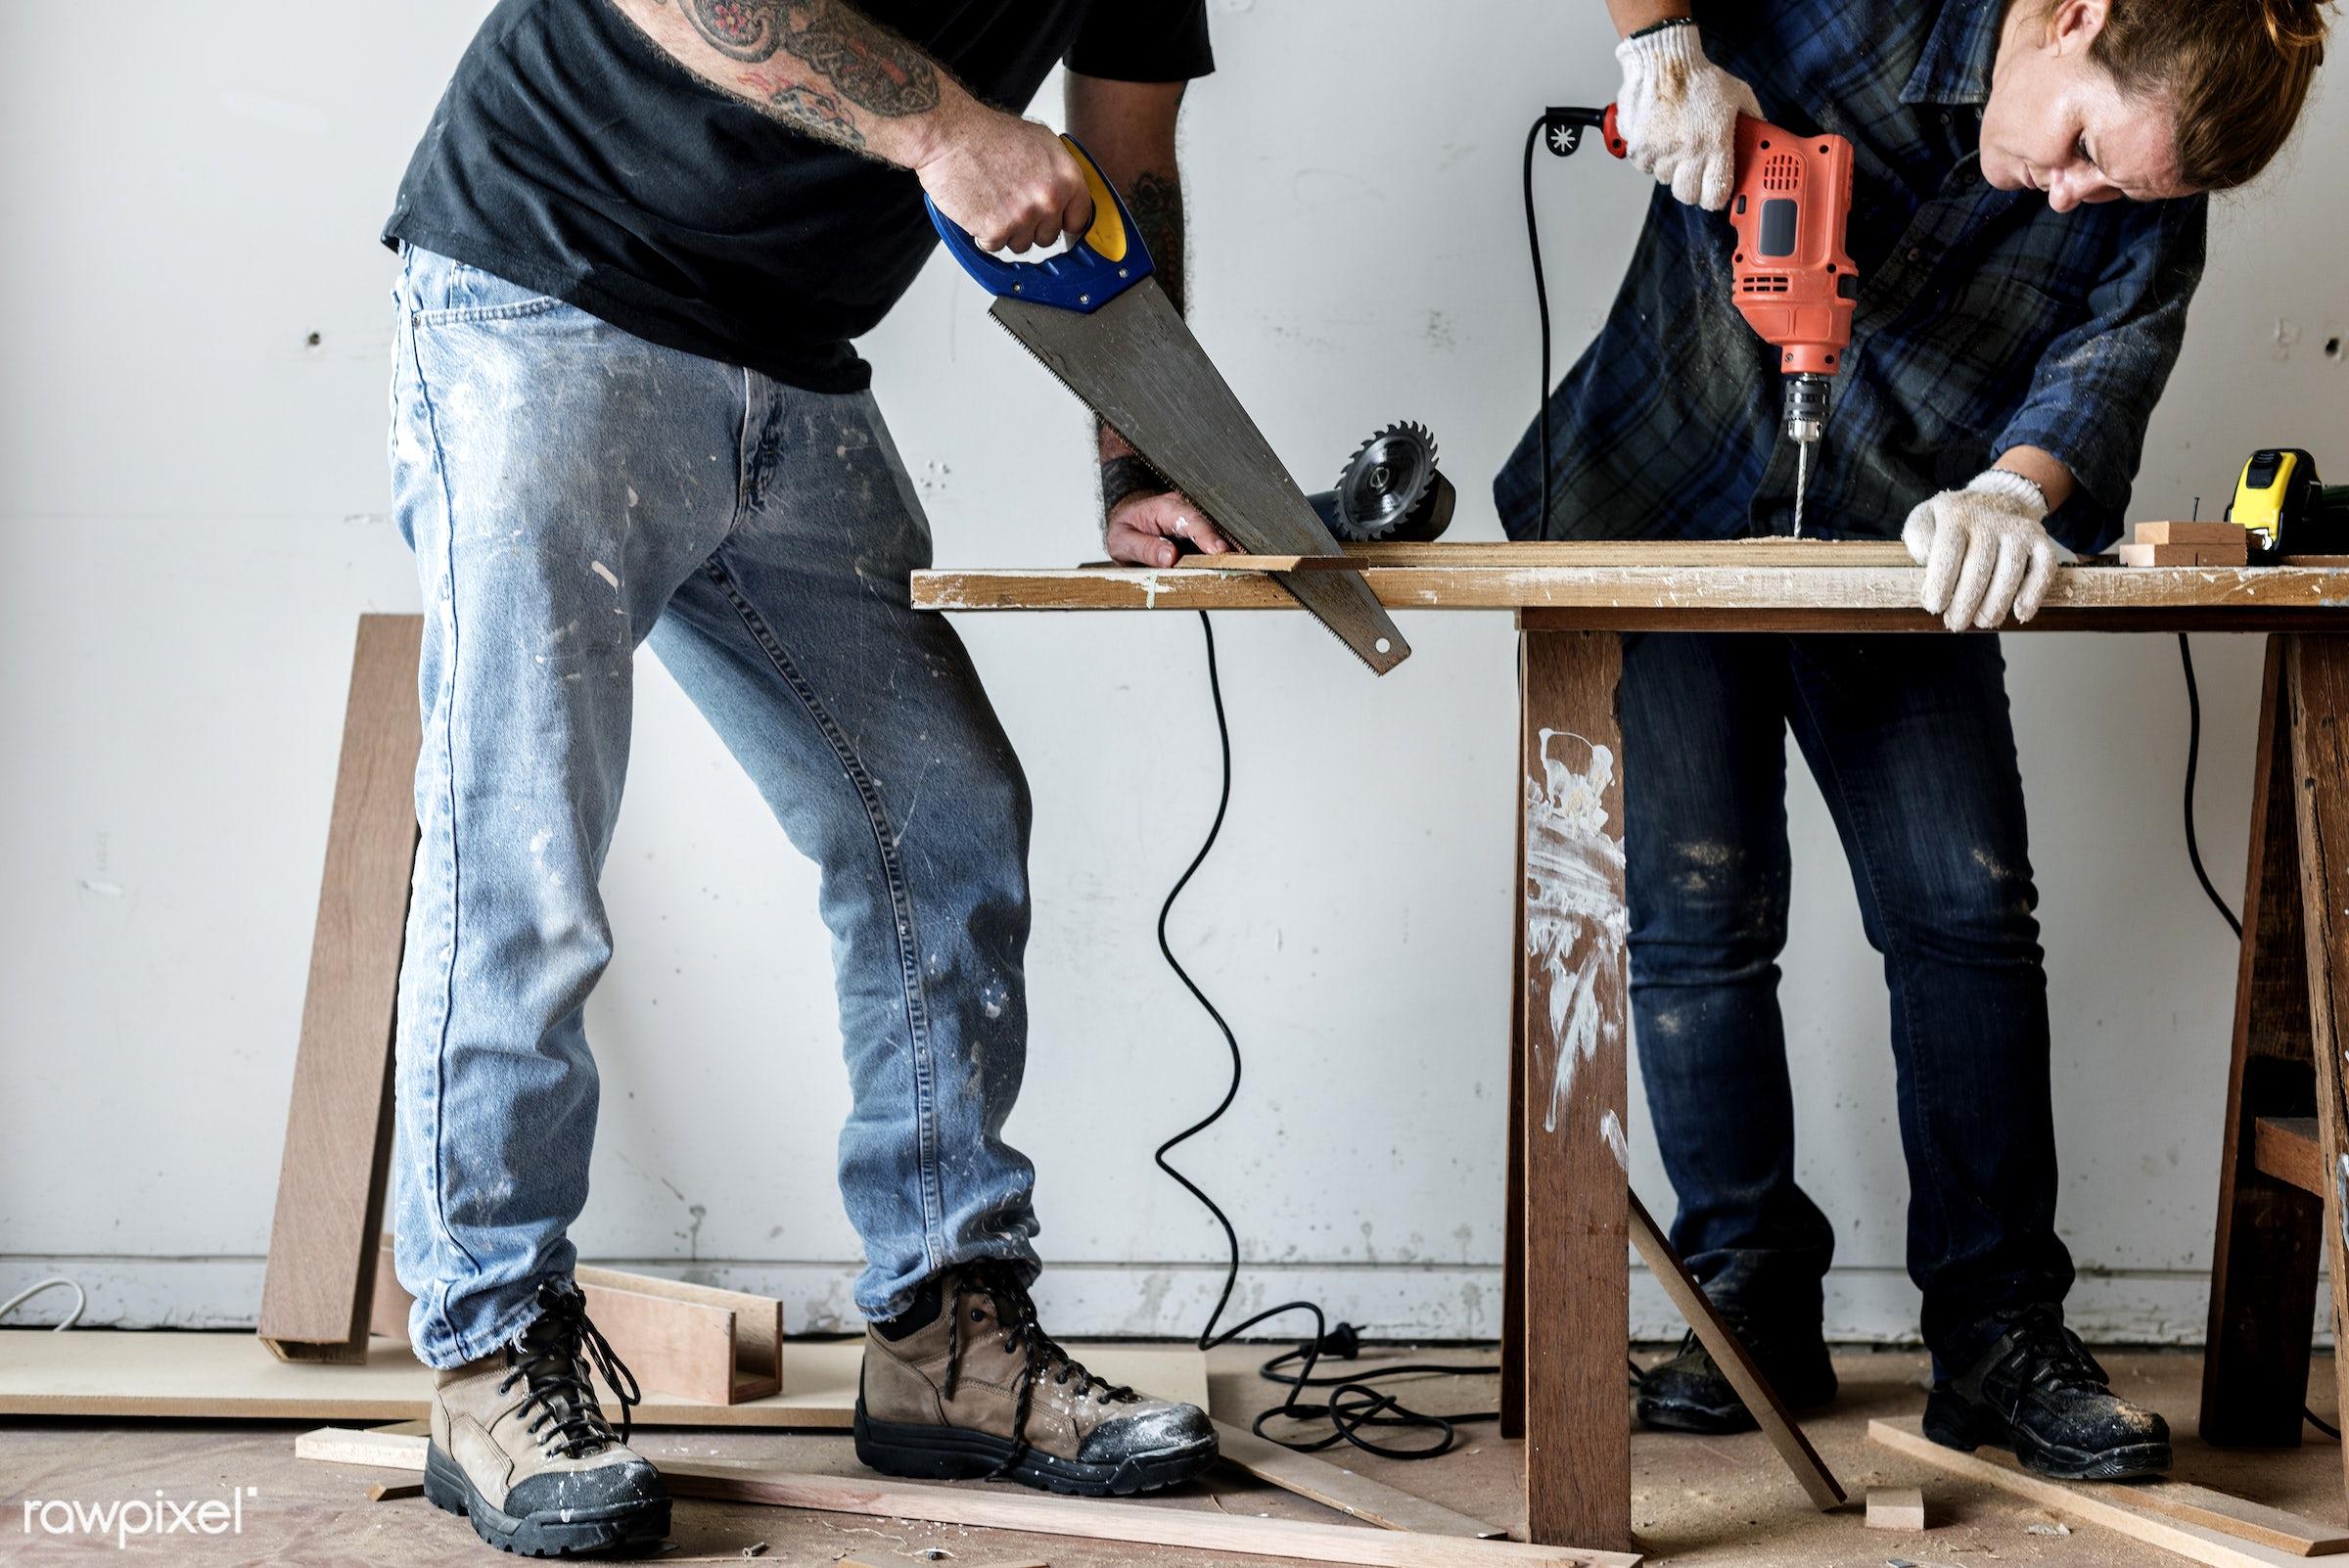 saw, activity, auger, augers, carpenter, carpentry, construction, craft, craftsman, design, diy, drill, drilling, equipment...